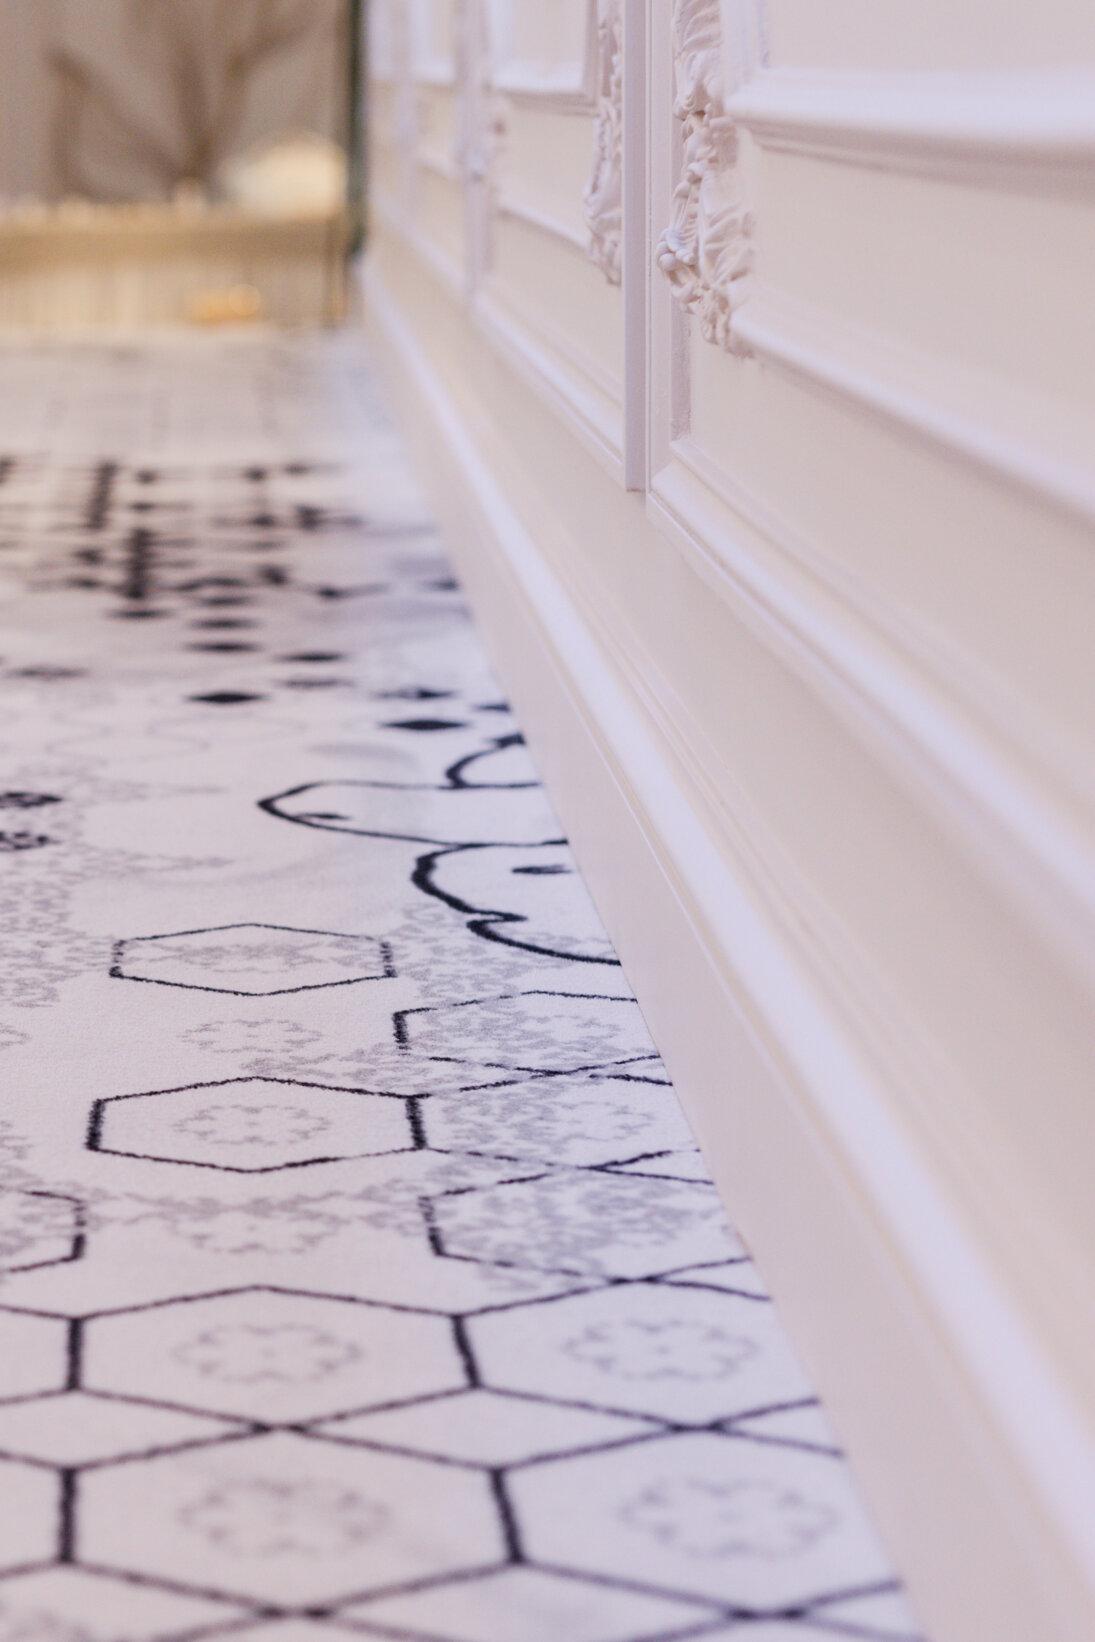 20210303-carpet&more-hotel-rocca-craiovaby-hugmedia-23